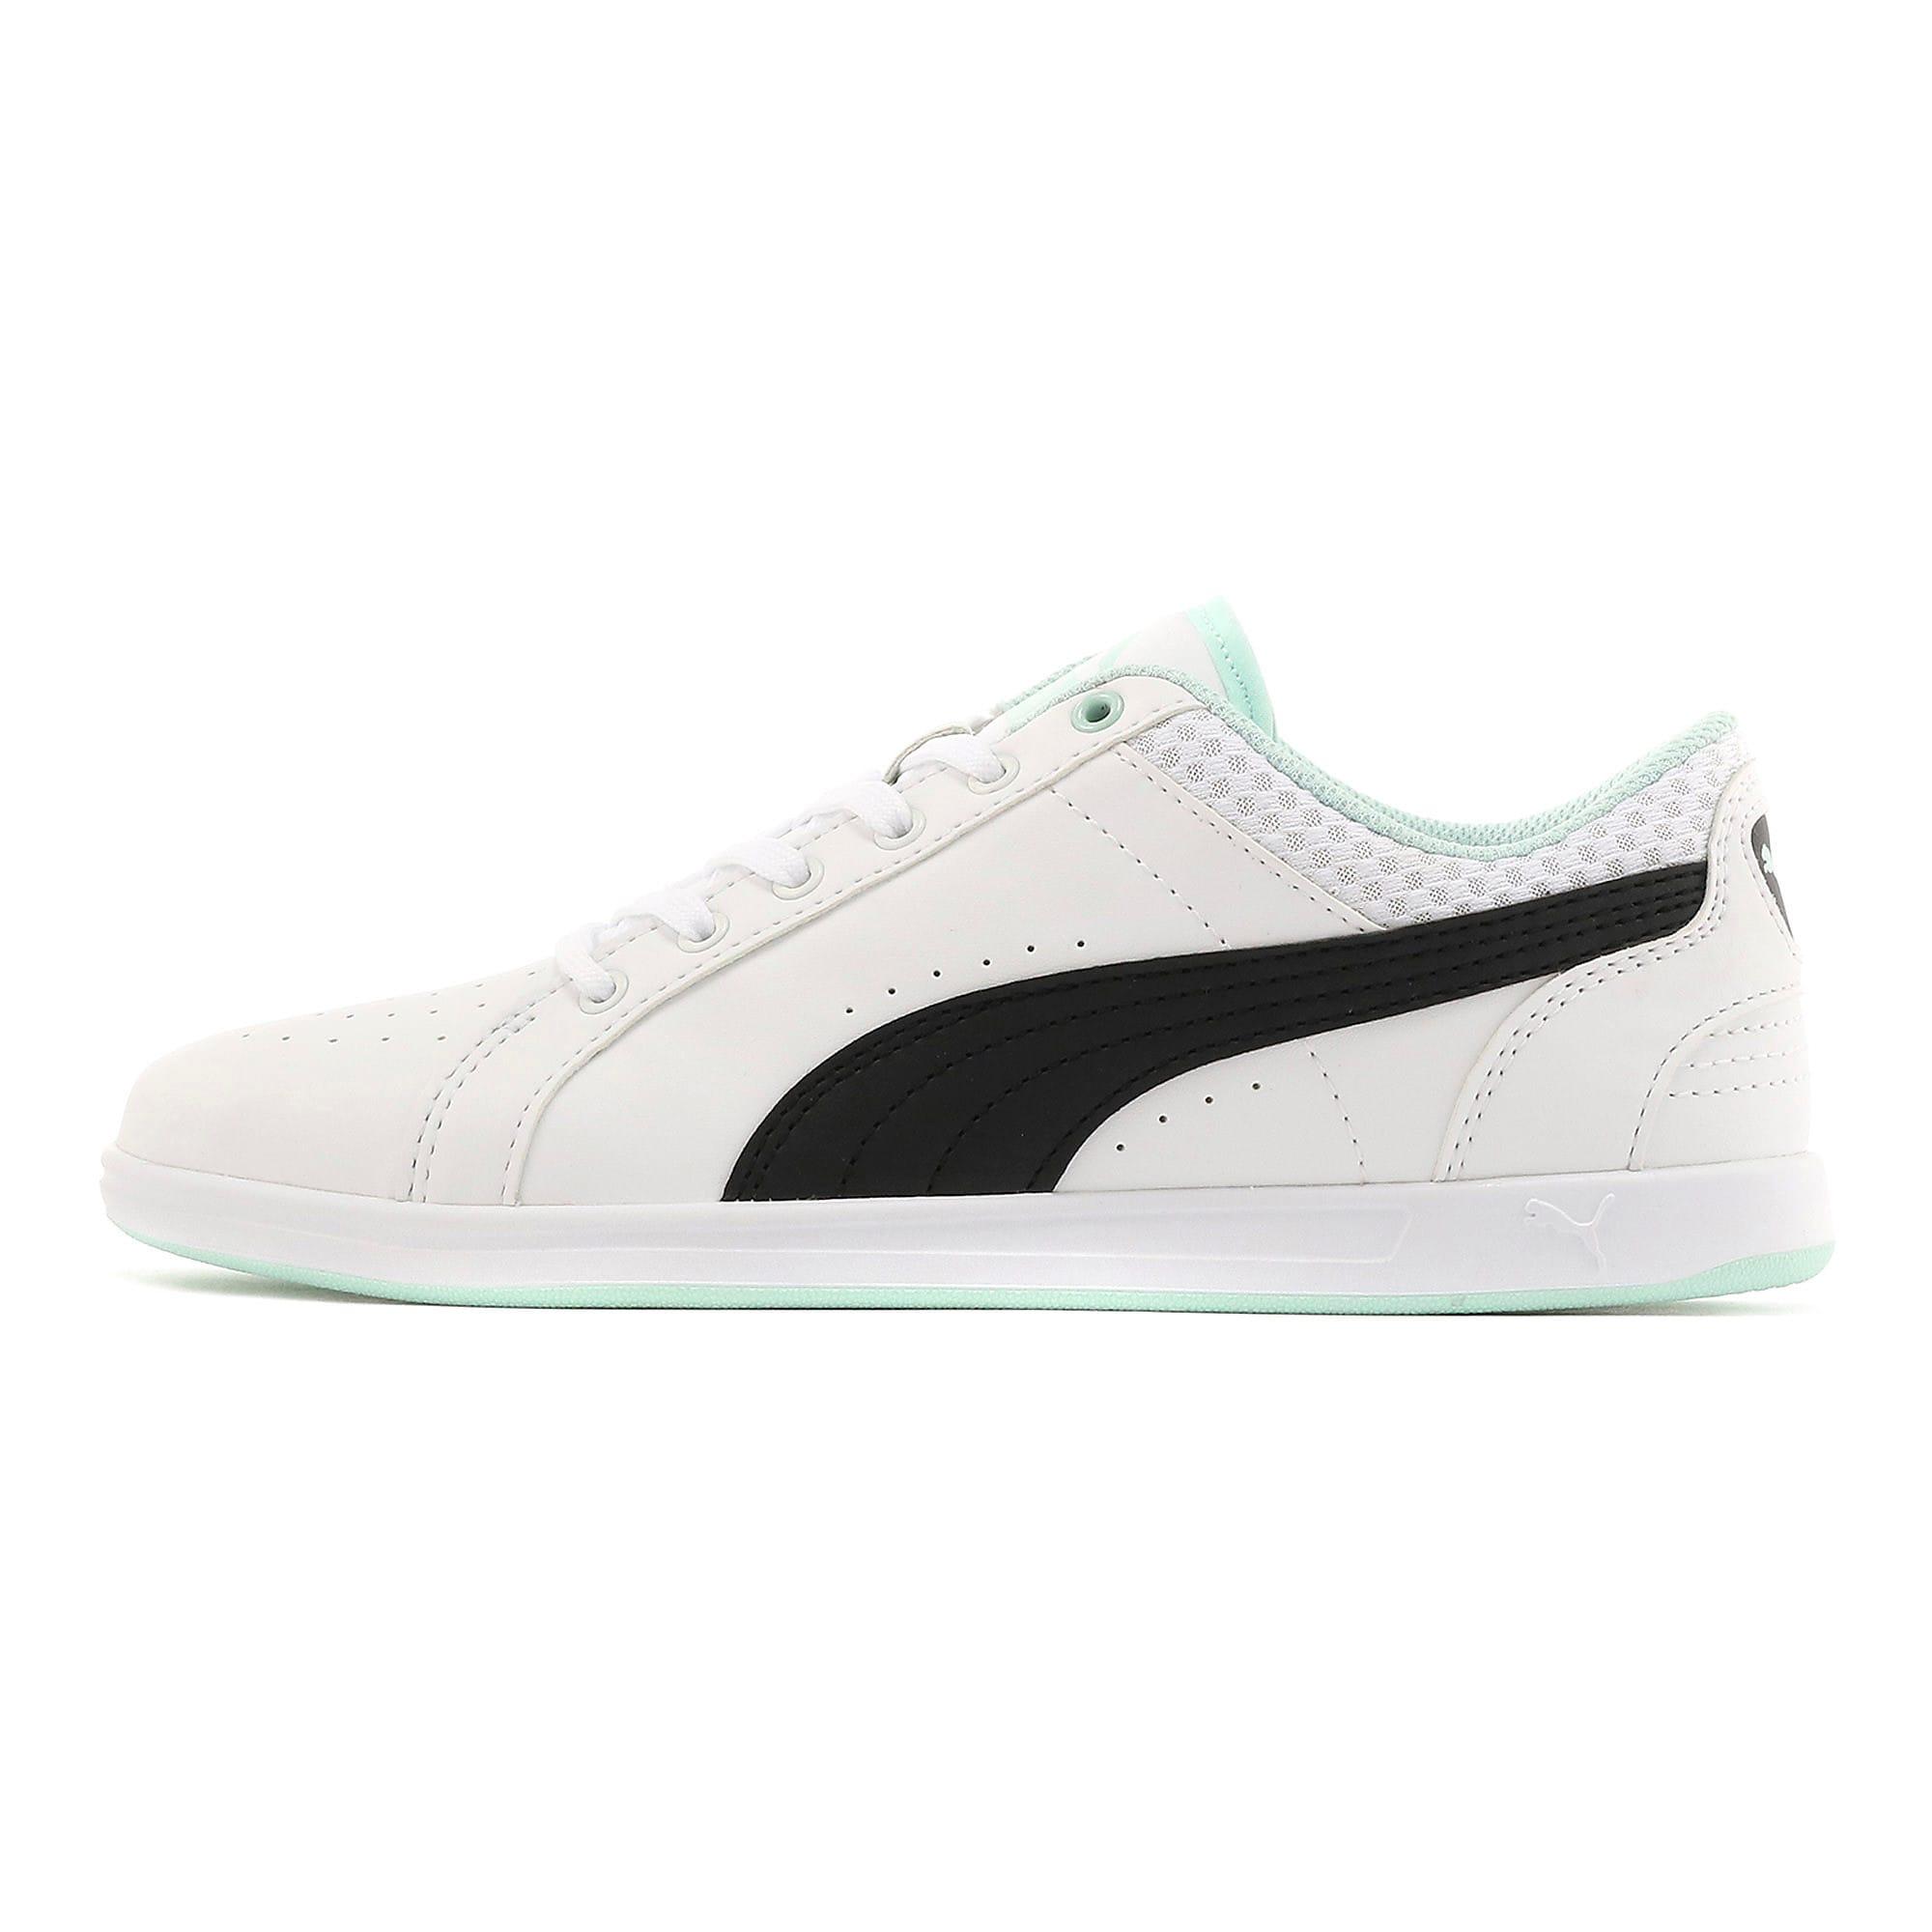 Thumbnail 1 of Ikaz Lo v2 Women's Sneakers, Puma White-Puma Black-, medium-IND